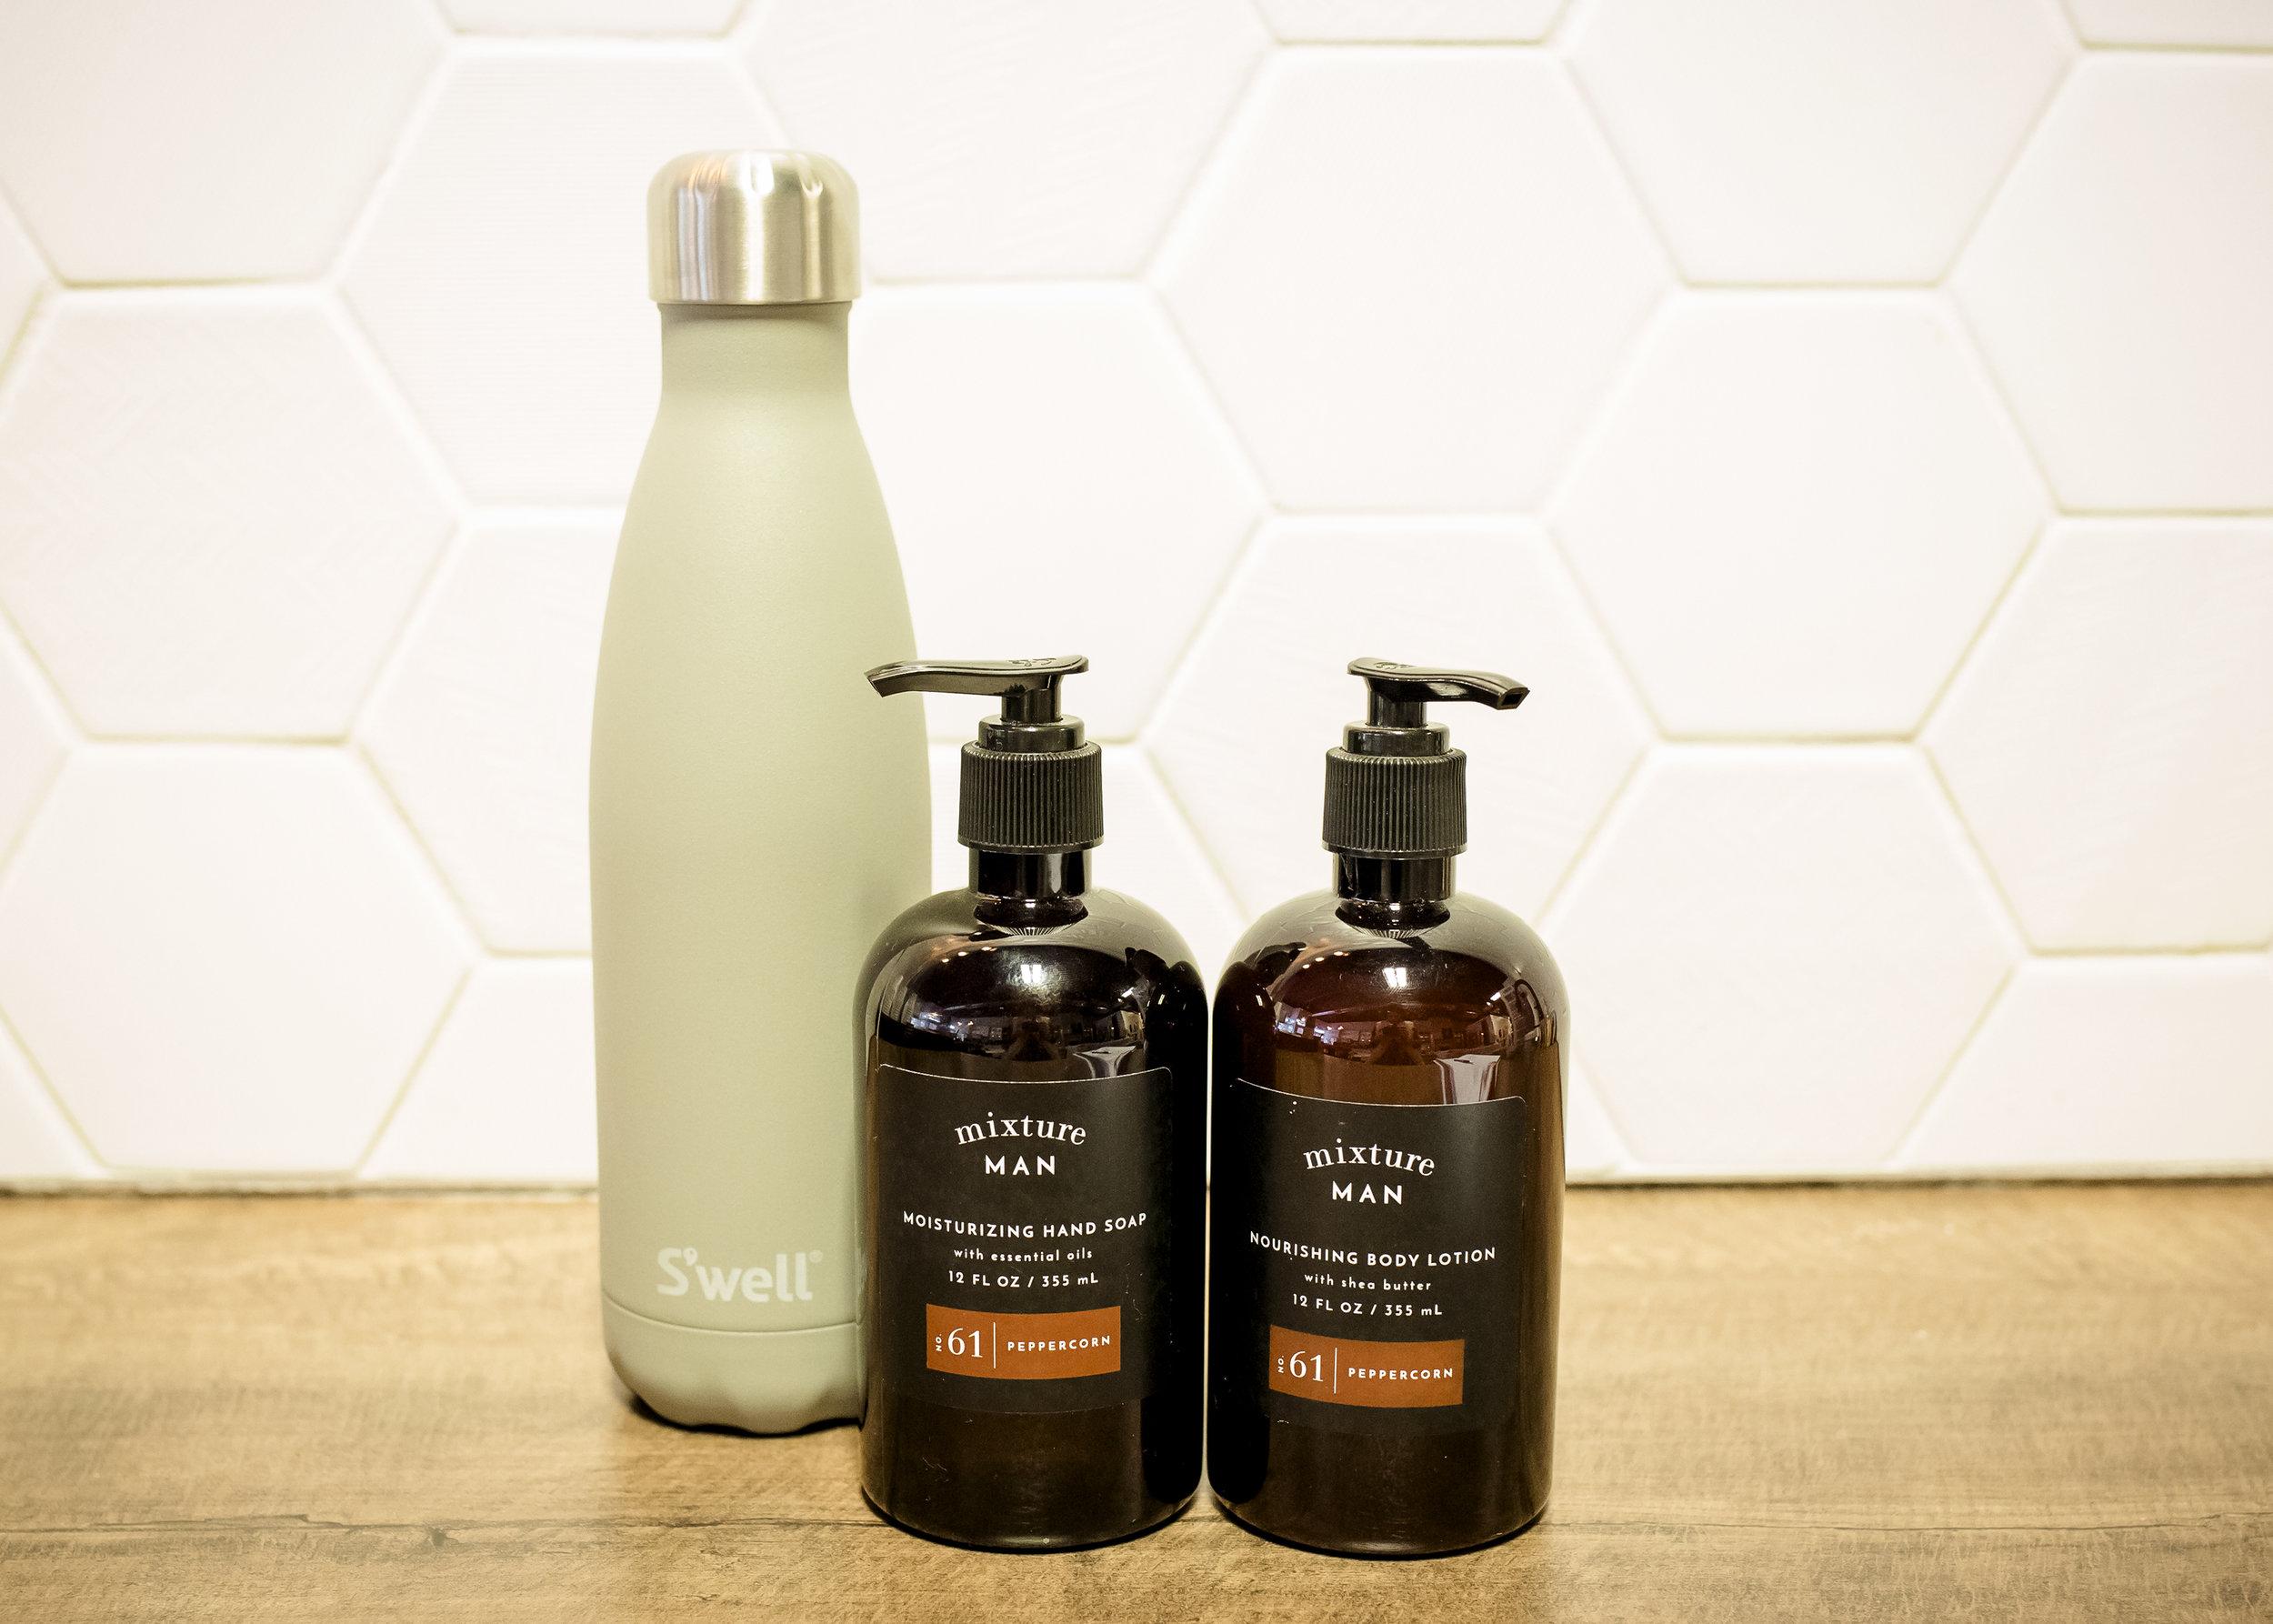 THE TEEN BOY - Mixture Man Hand Soap | $17Mixture Man Body Lotion | $23S'Well Bottle | $35